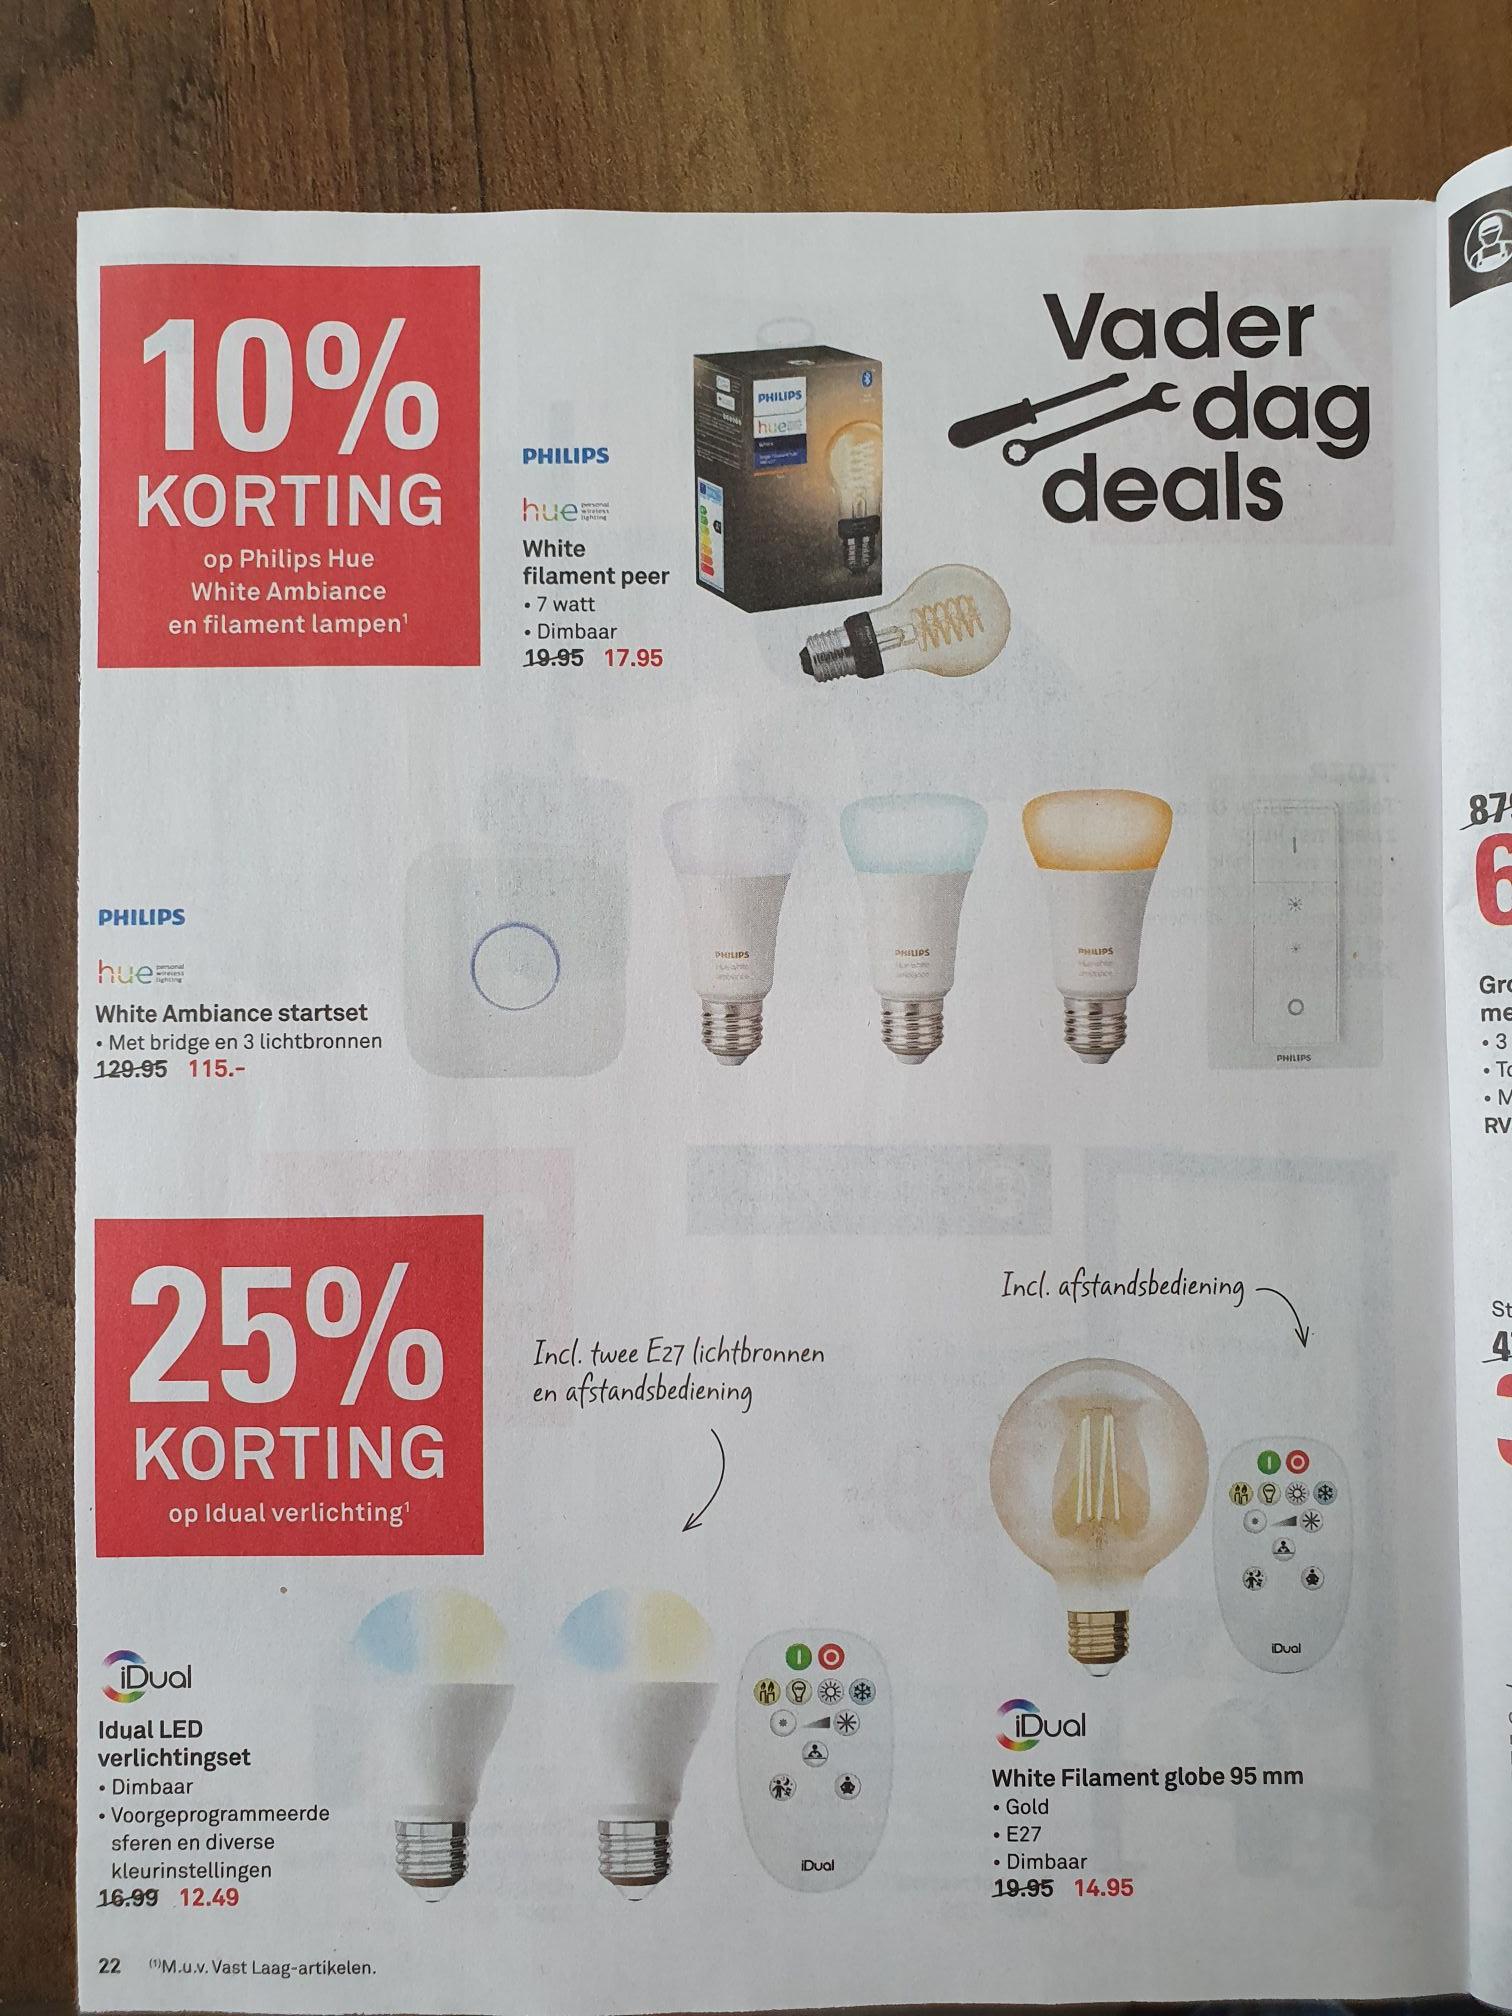 10% korting op Philips Hue White Ambiance en filament lampen @Karwei